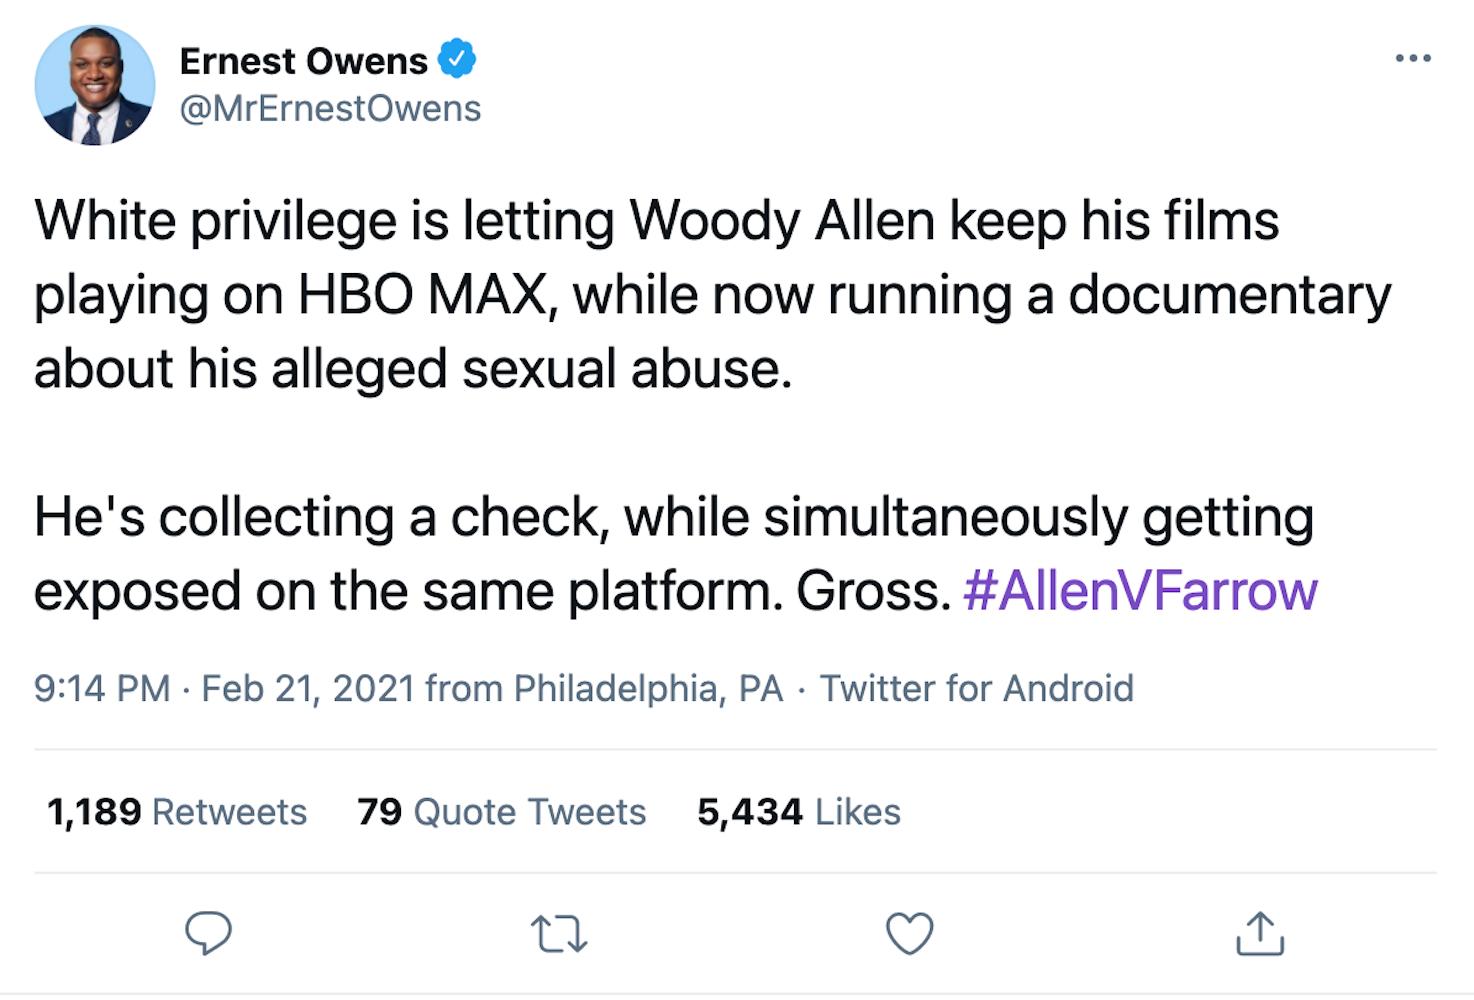 allen v farrow ernest owens tweet